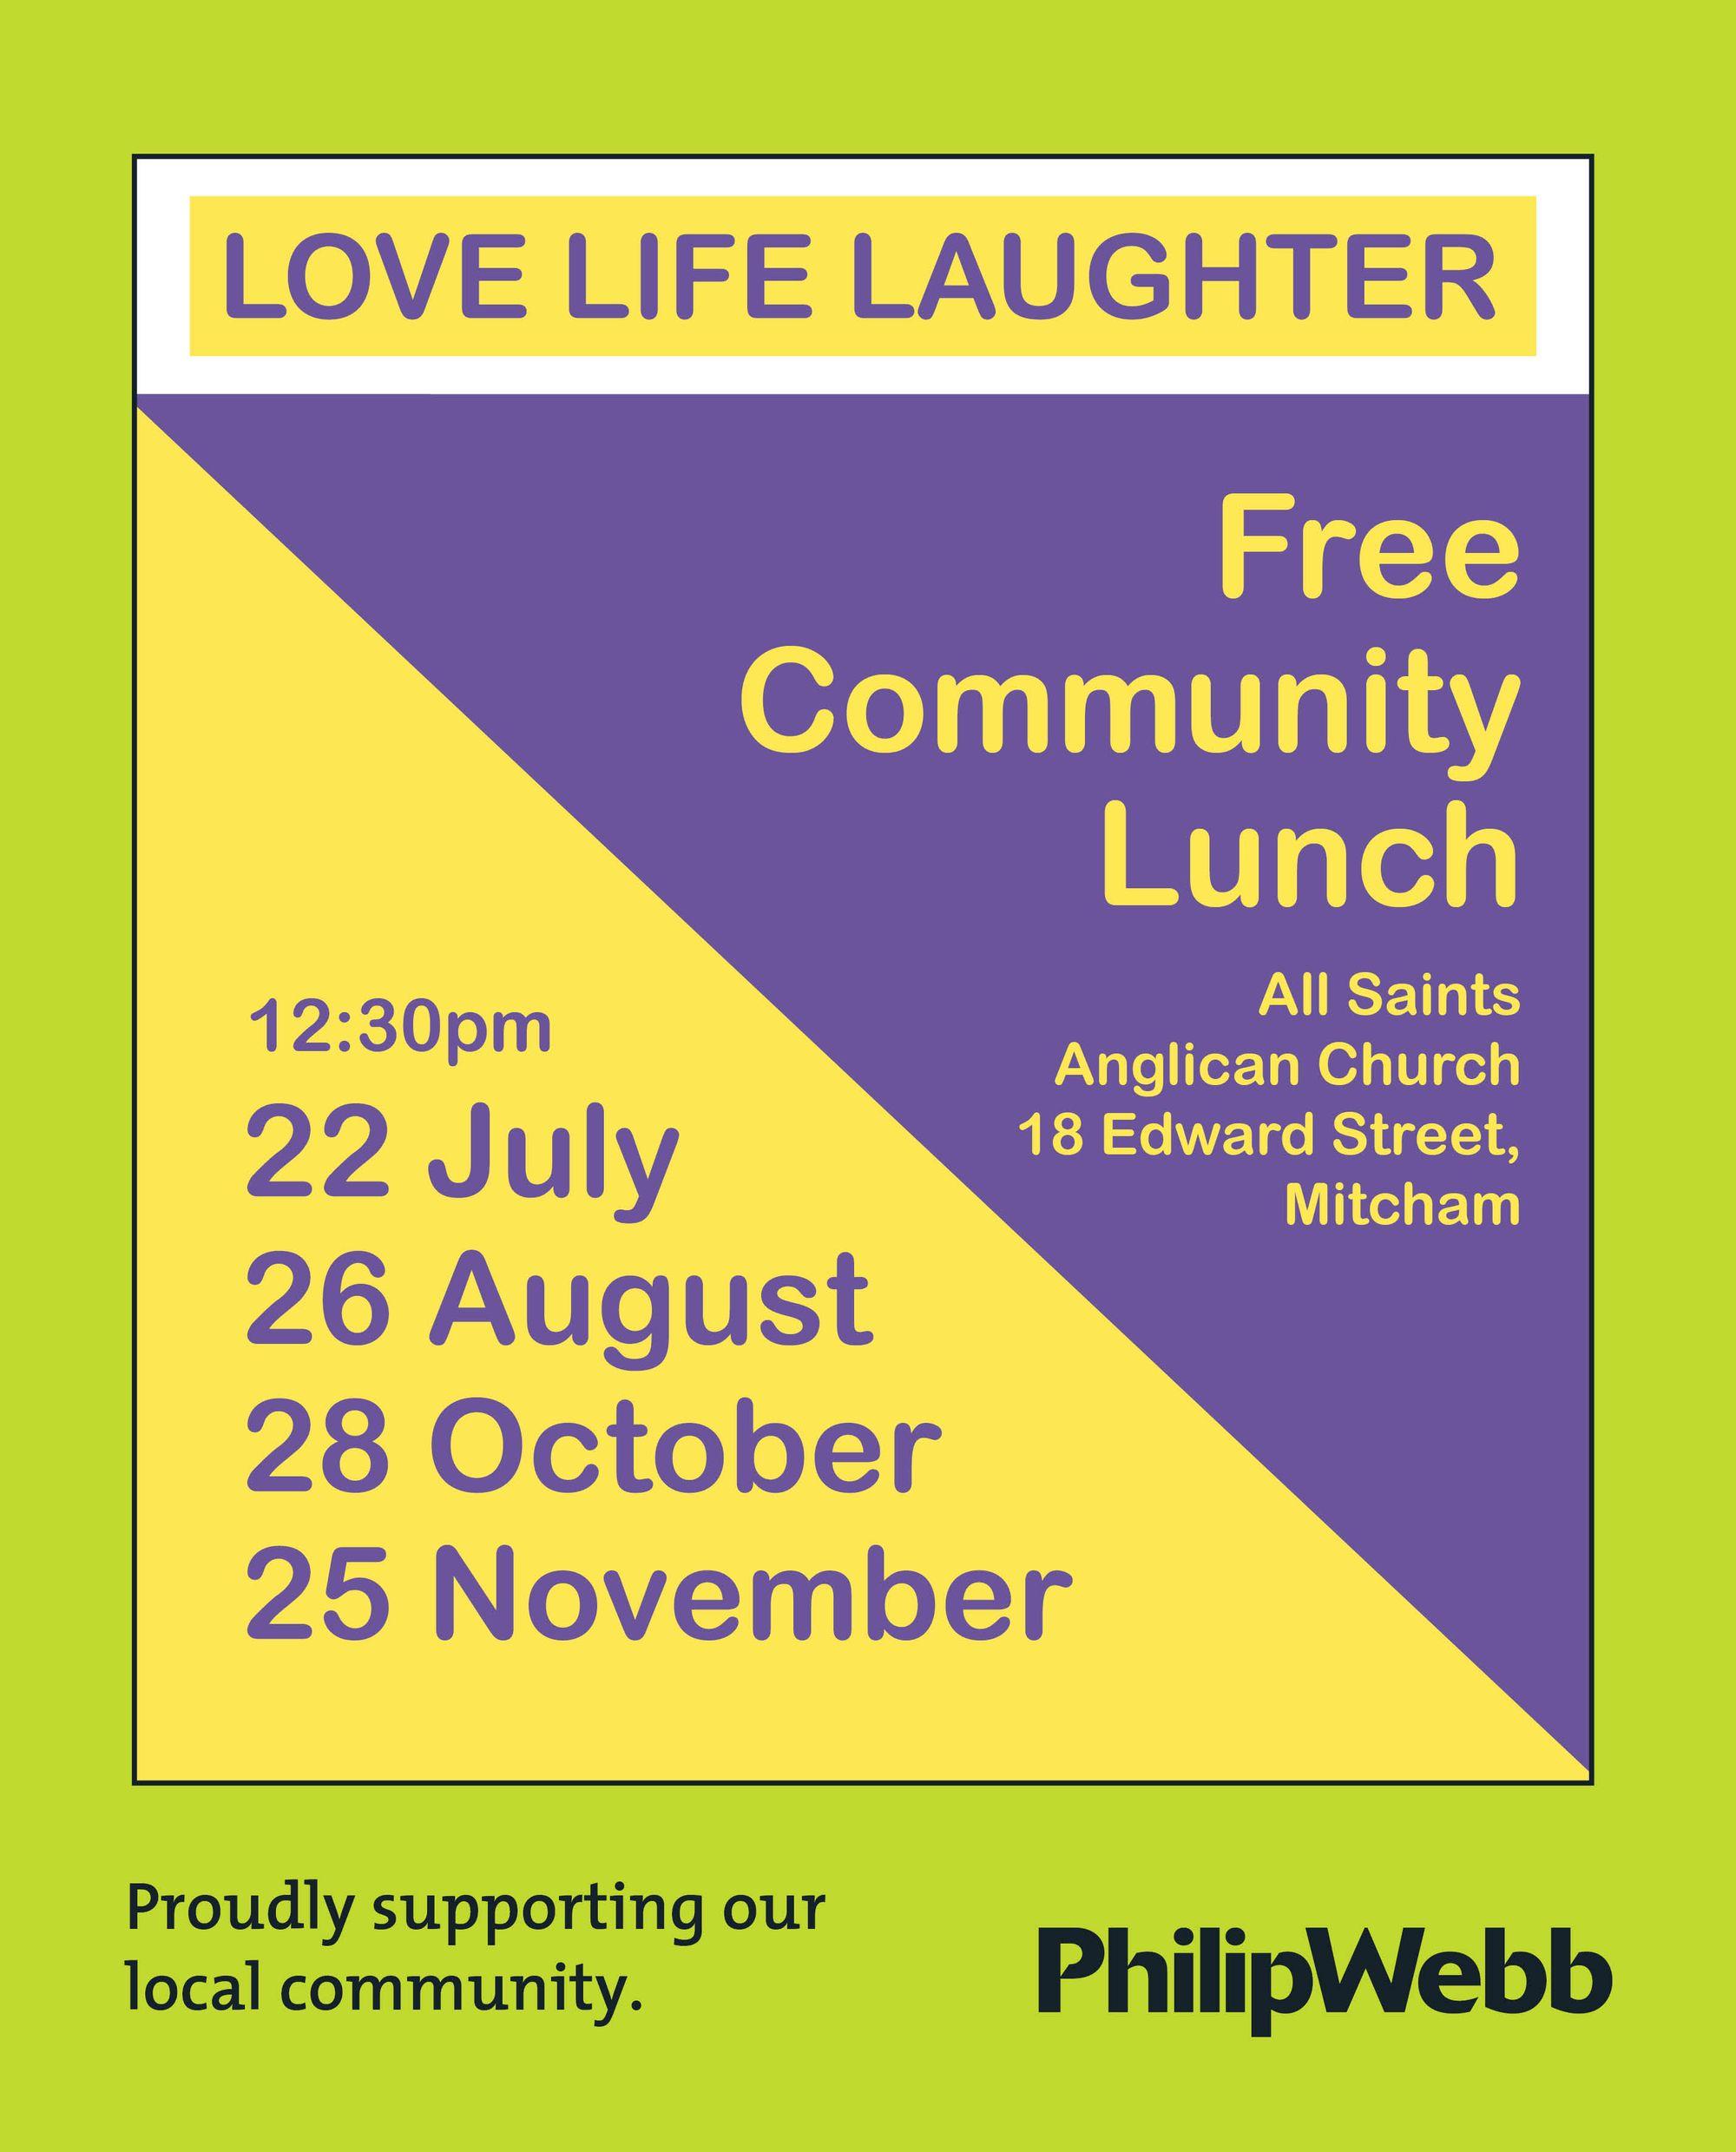 Free Community Lunch